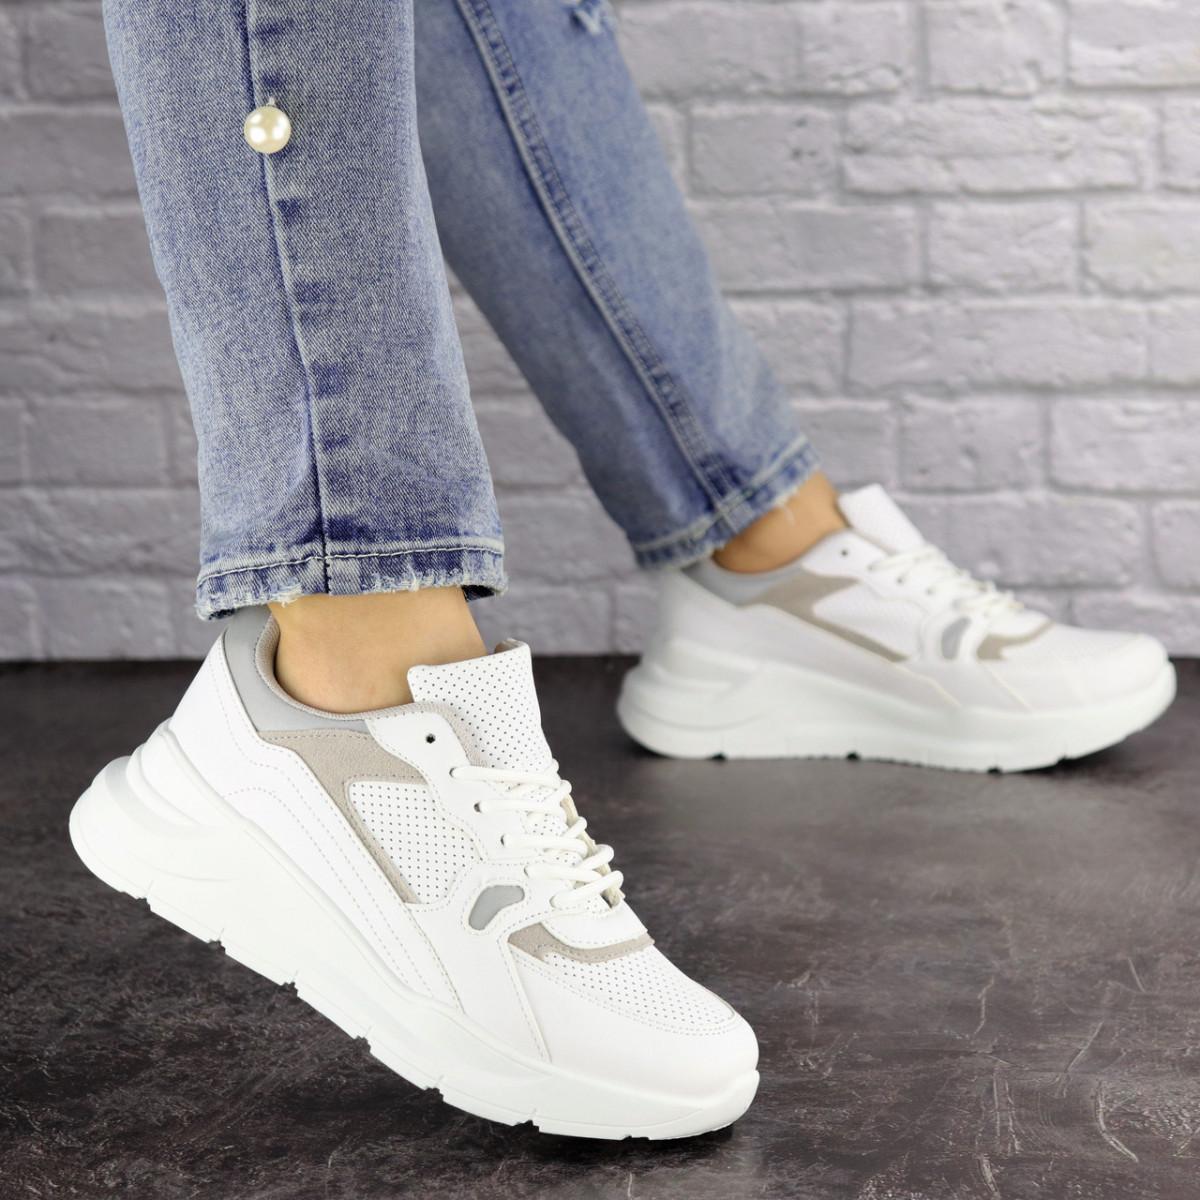 Женские белые кроссовки Gambino 1518 (37 размер)